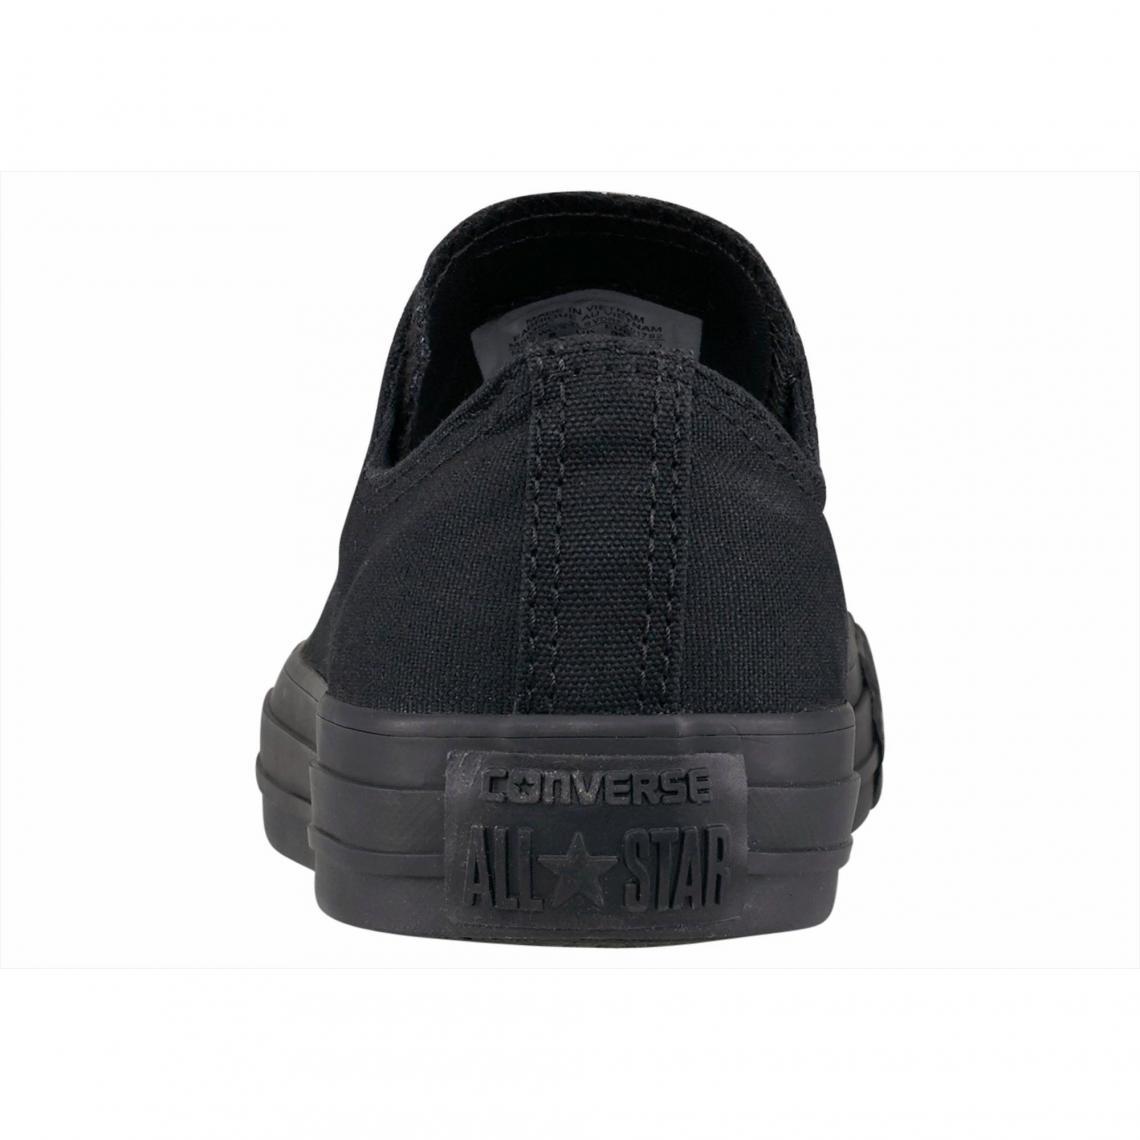 df345760c6e6 Sneaker basses homme Converse Chuck Taylor All Star Seasonal Ox Monochrome  - Noir - Noir Converse